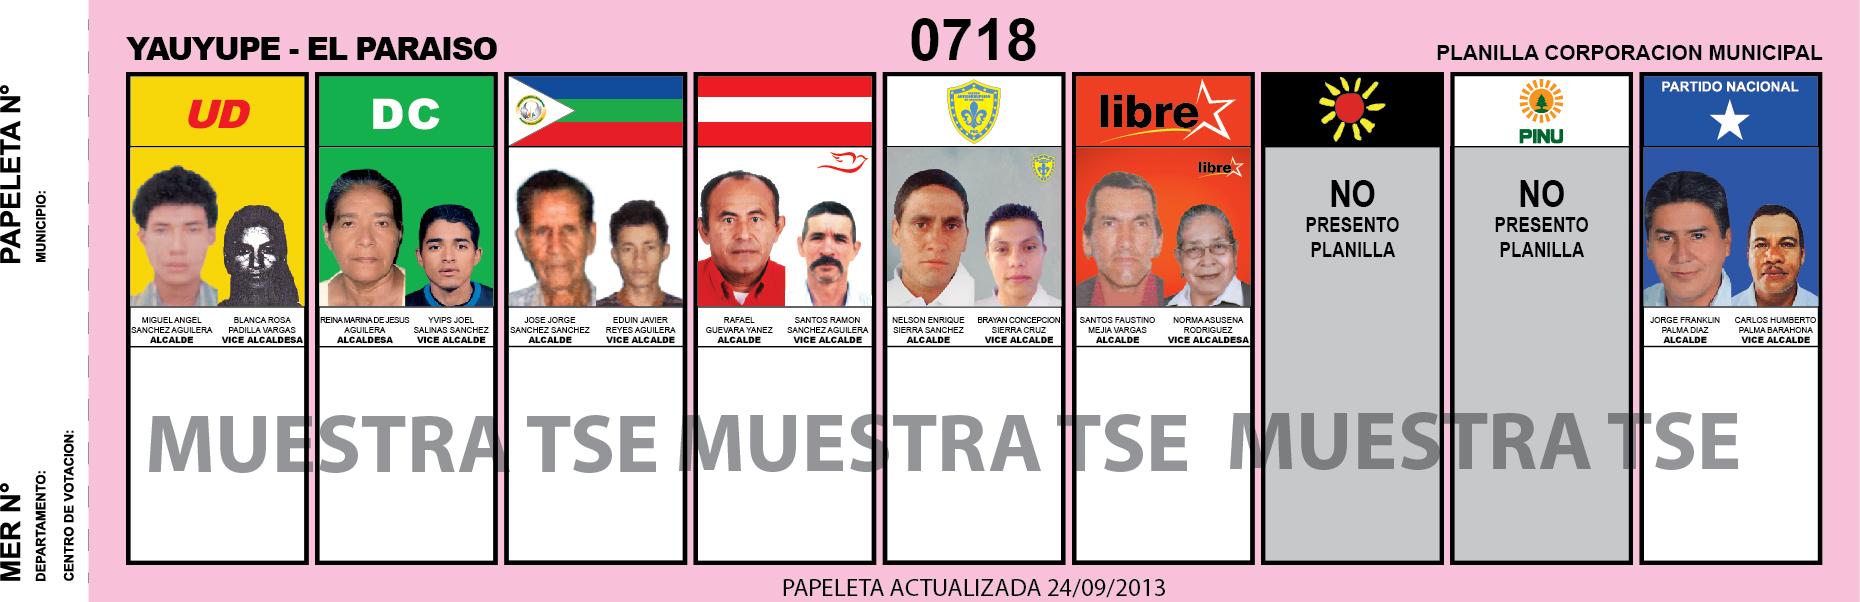 CANDIDATOS 2013 MUNICIPIO YAUYUPE - EL PARAISO - HONDURAS